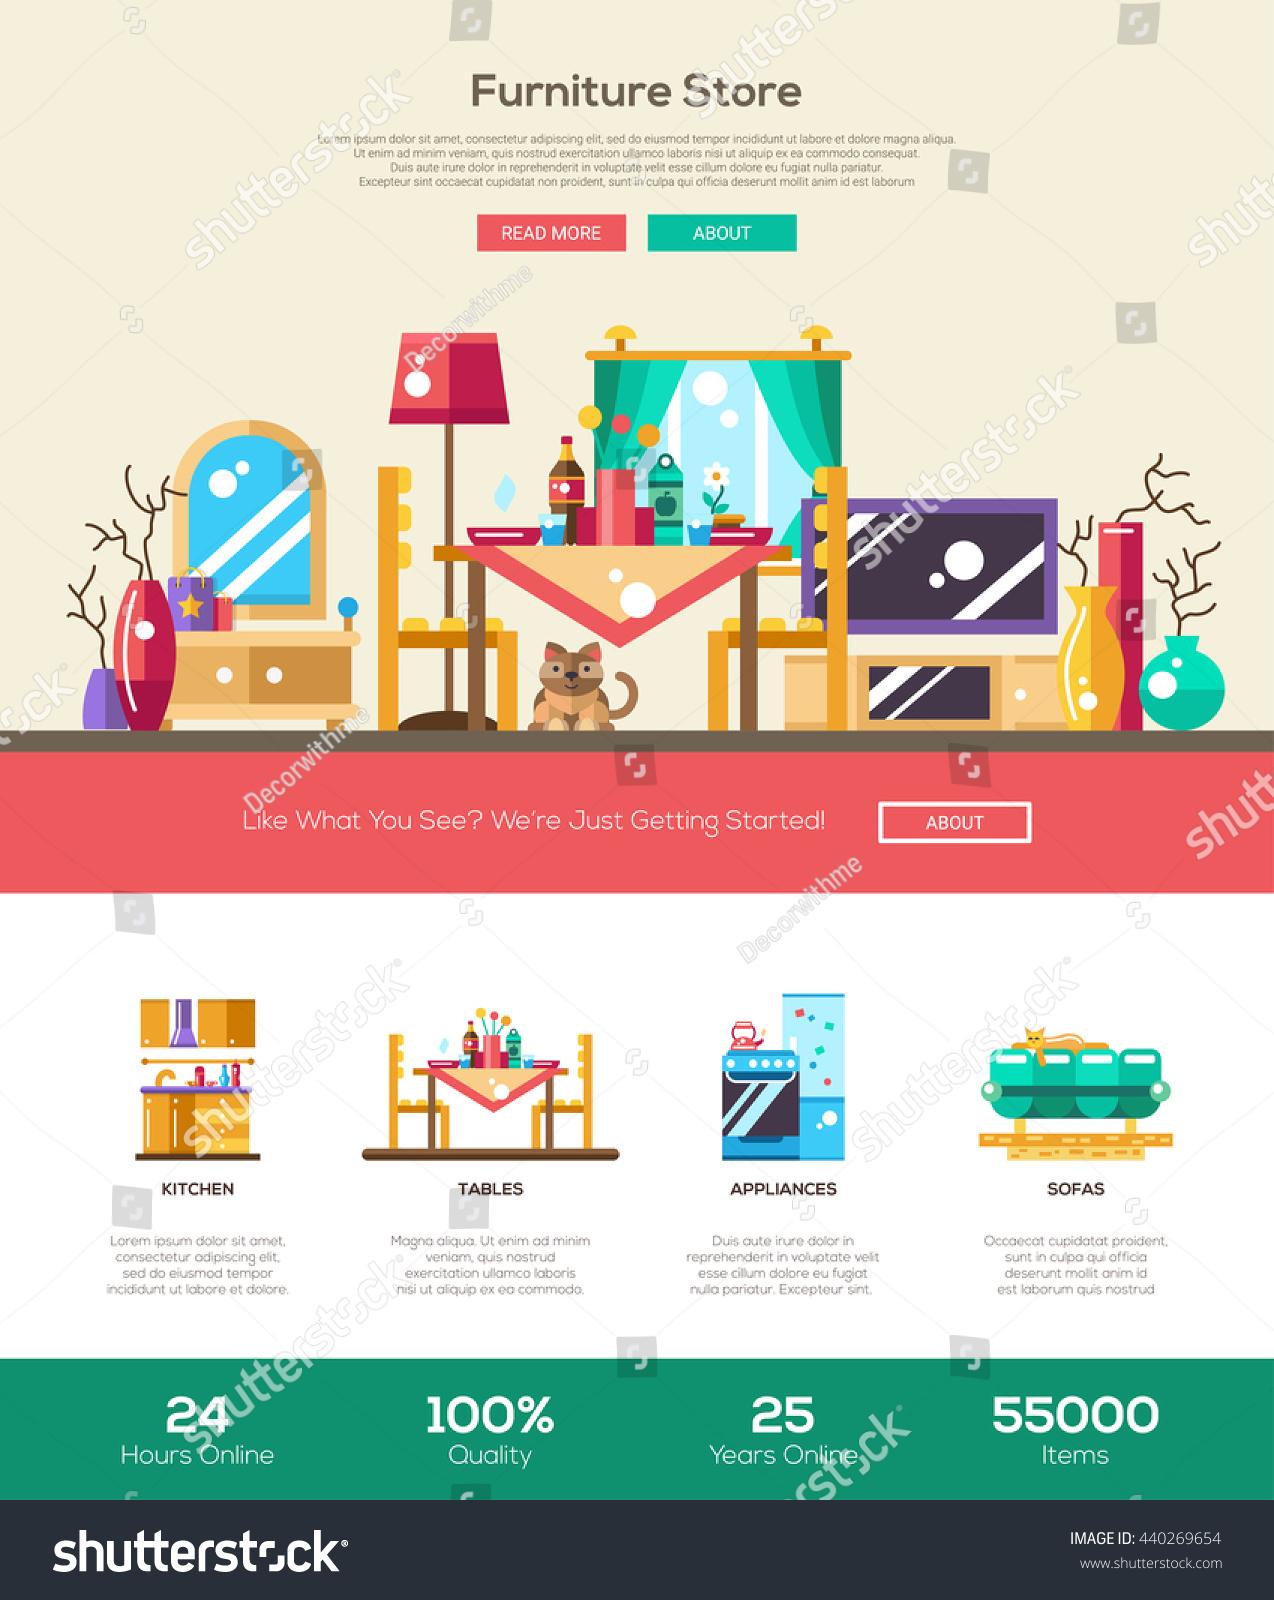 house interior domestic furniture online store stock illustration 440269654 shutterstock. Black Bedroom Furniture Sets. Home Design Ideas